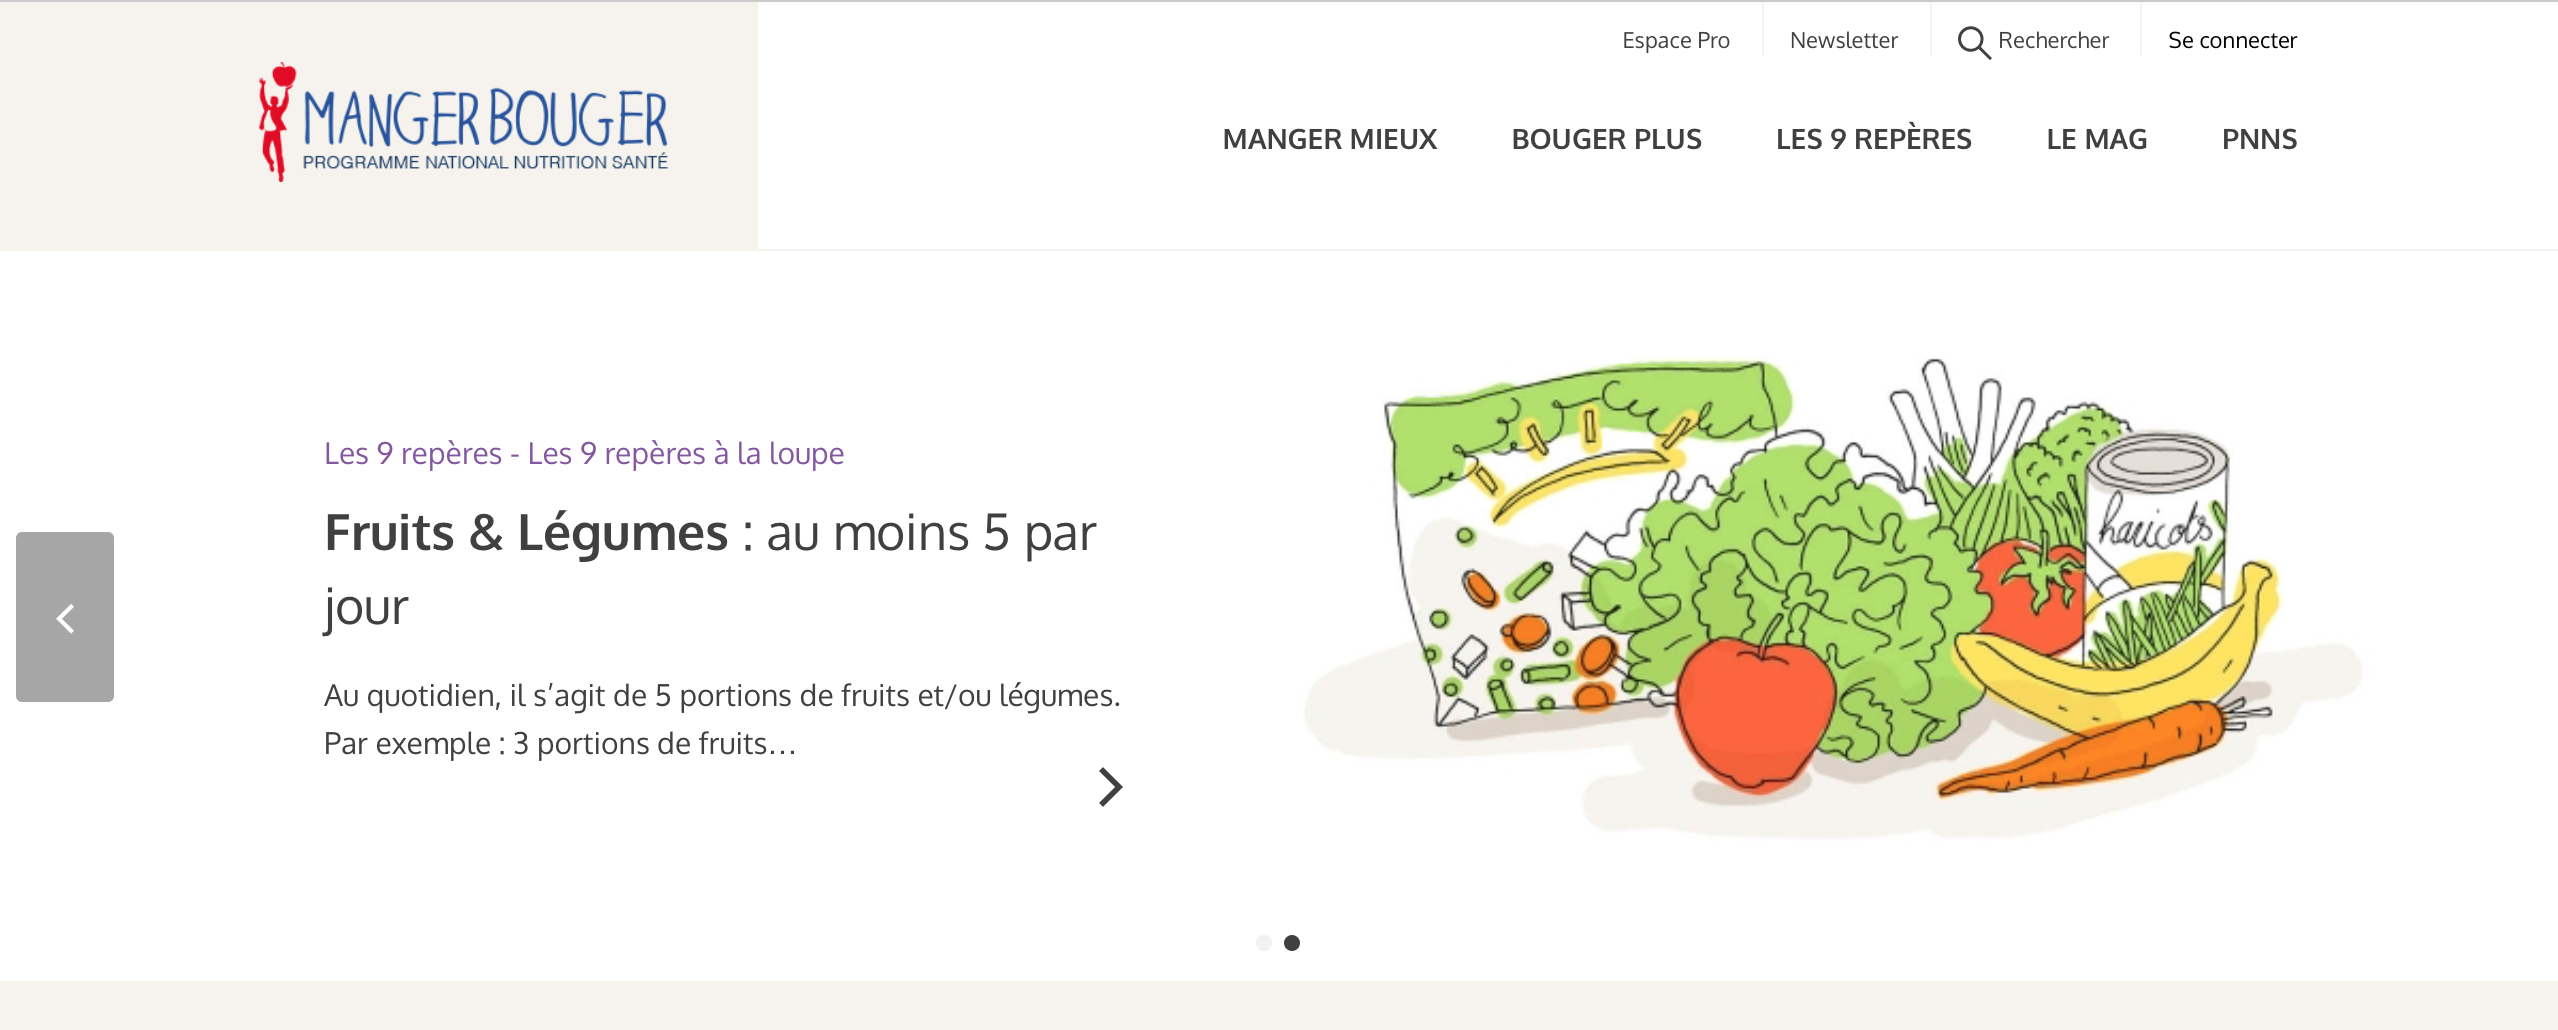 McDo Bourg Viriat - Manger bouger